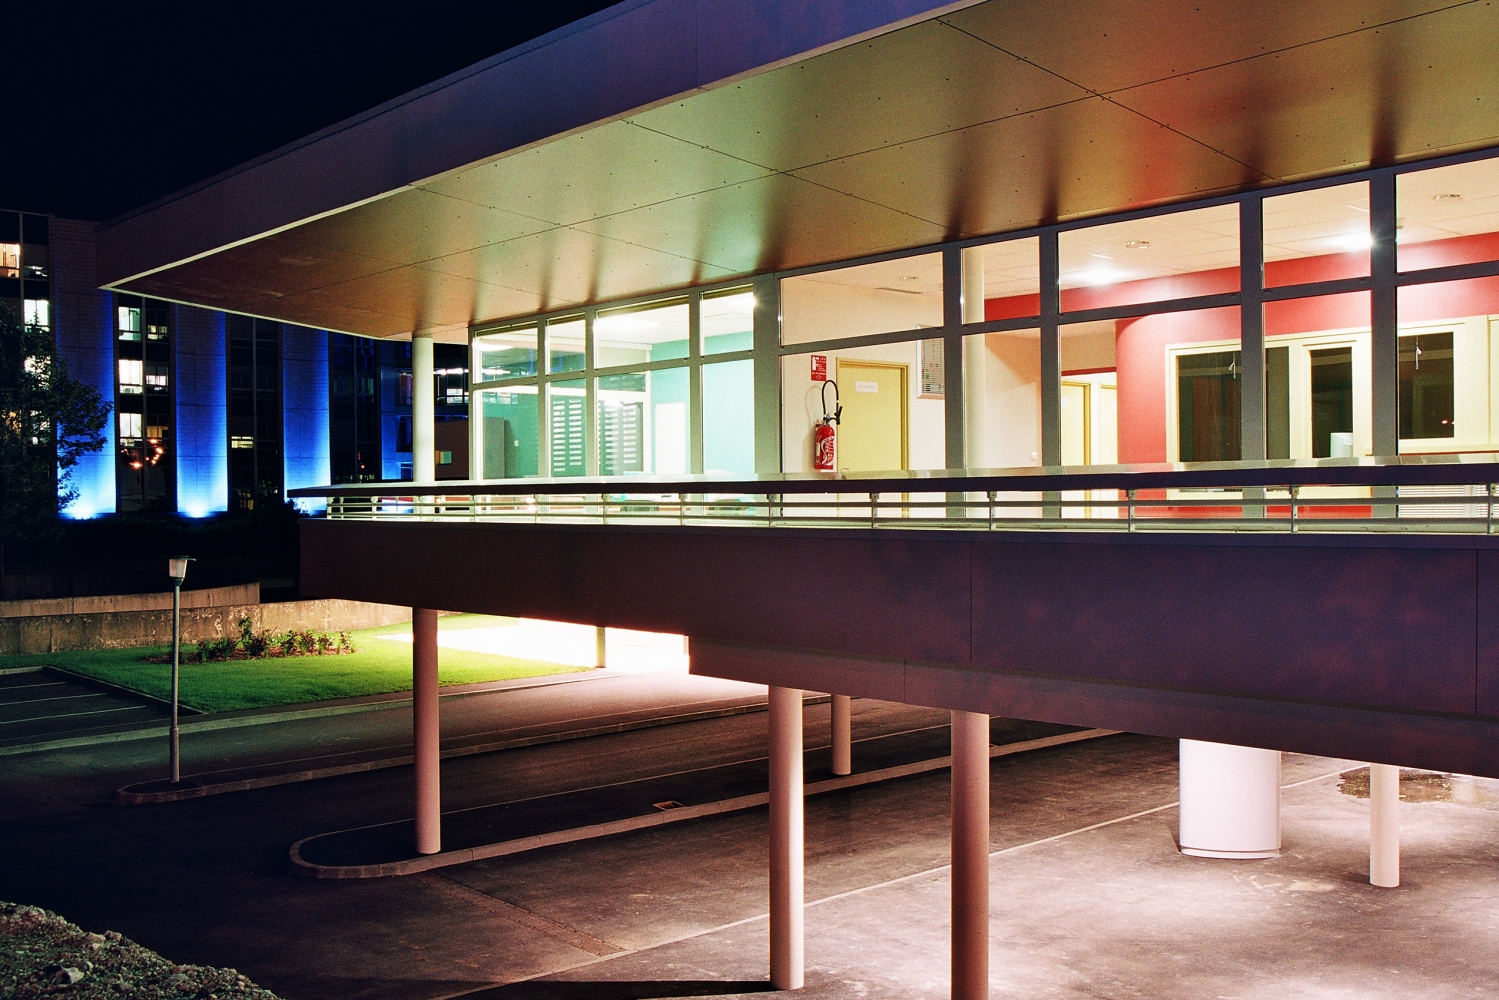 11-amiens-img-009 Pascale SEURIN Architecte - Pascale SEURIN Architecte